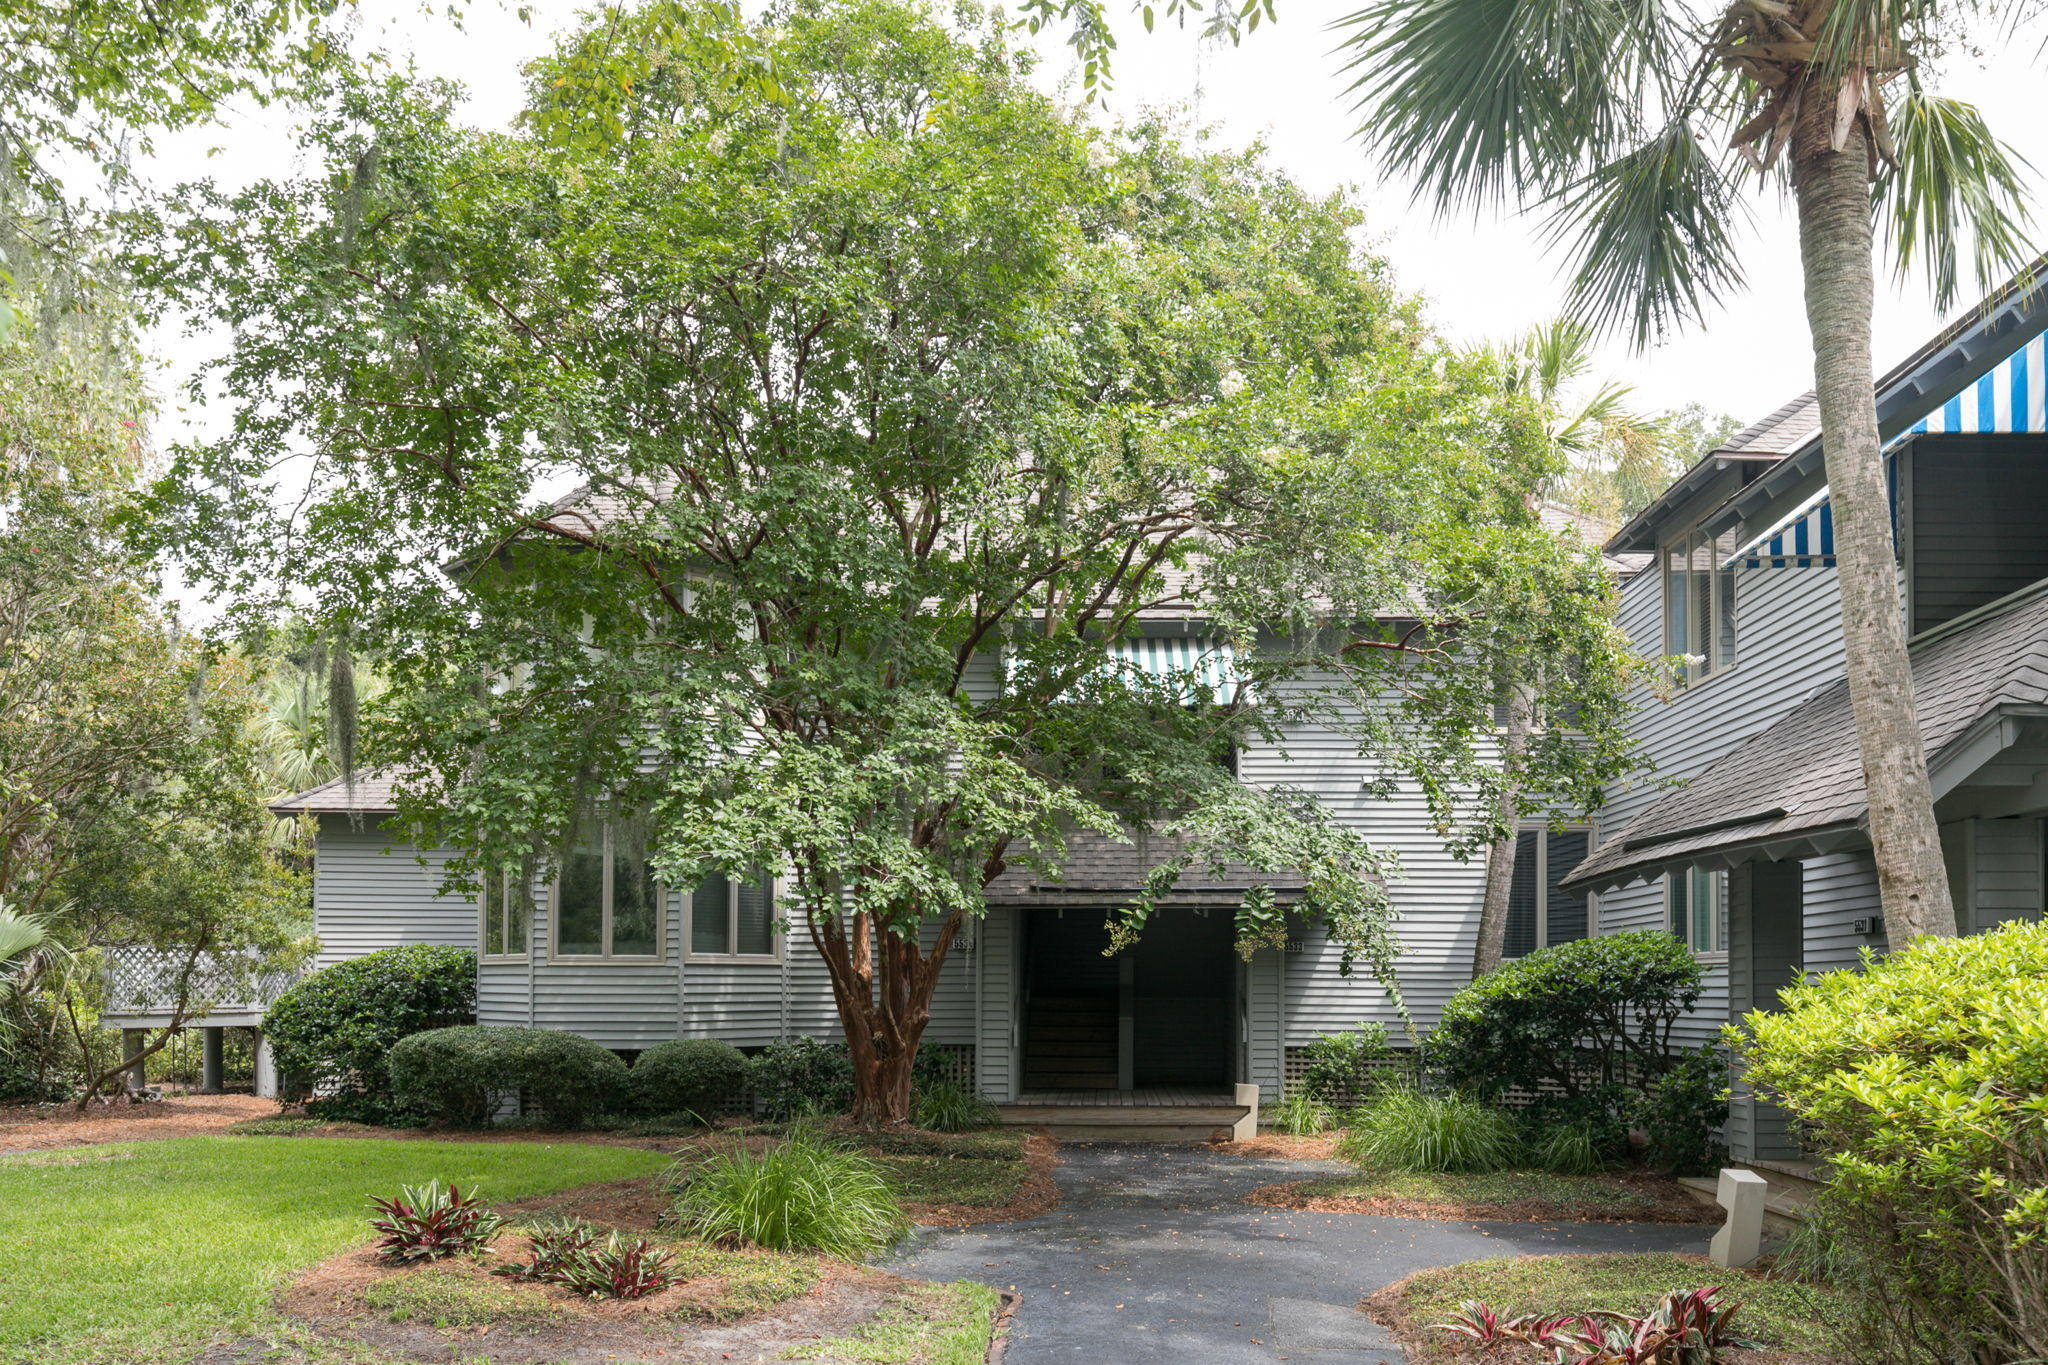 Kiawah Island Homes For Sale - 5534 Green Dolphin, Kiawah Island, SC - 28